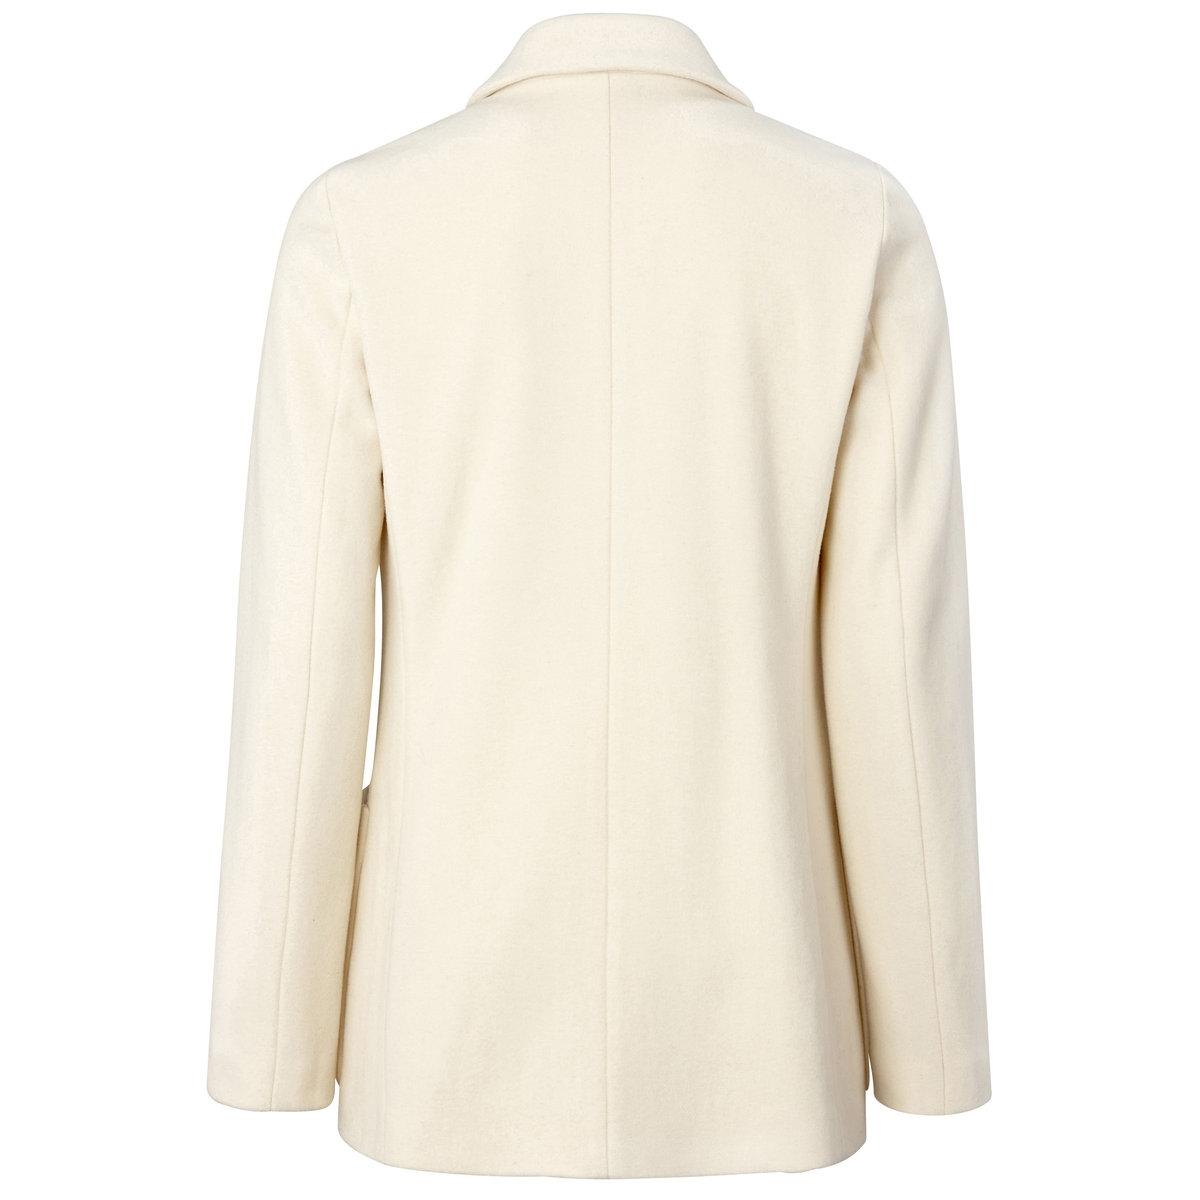 Жакет, 100% шерстиЖакет из 100% шерсти. Двубортная планка застежки. 1 карман спереди. 2 накладных кармана. Длина 71 см..<br><br>Цвет: фуксия,экрю<br>Размер: 42 (FR) - 48 (RUS).38 (FR) - 44 (RUS)